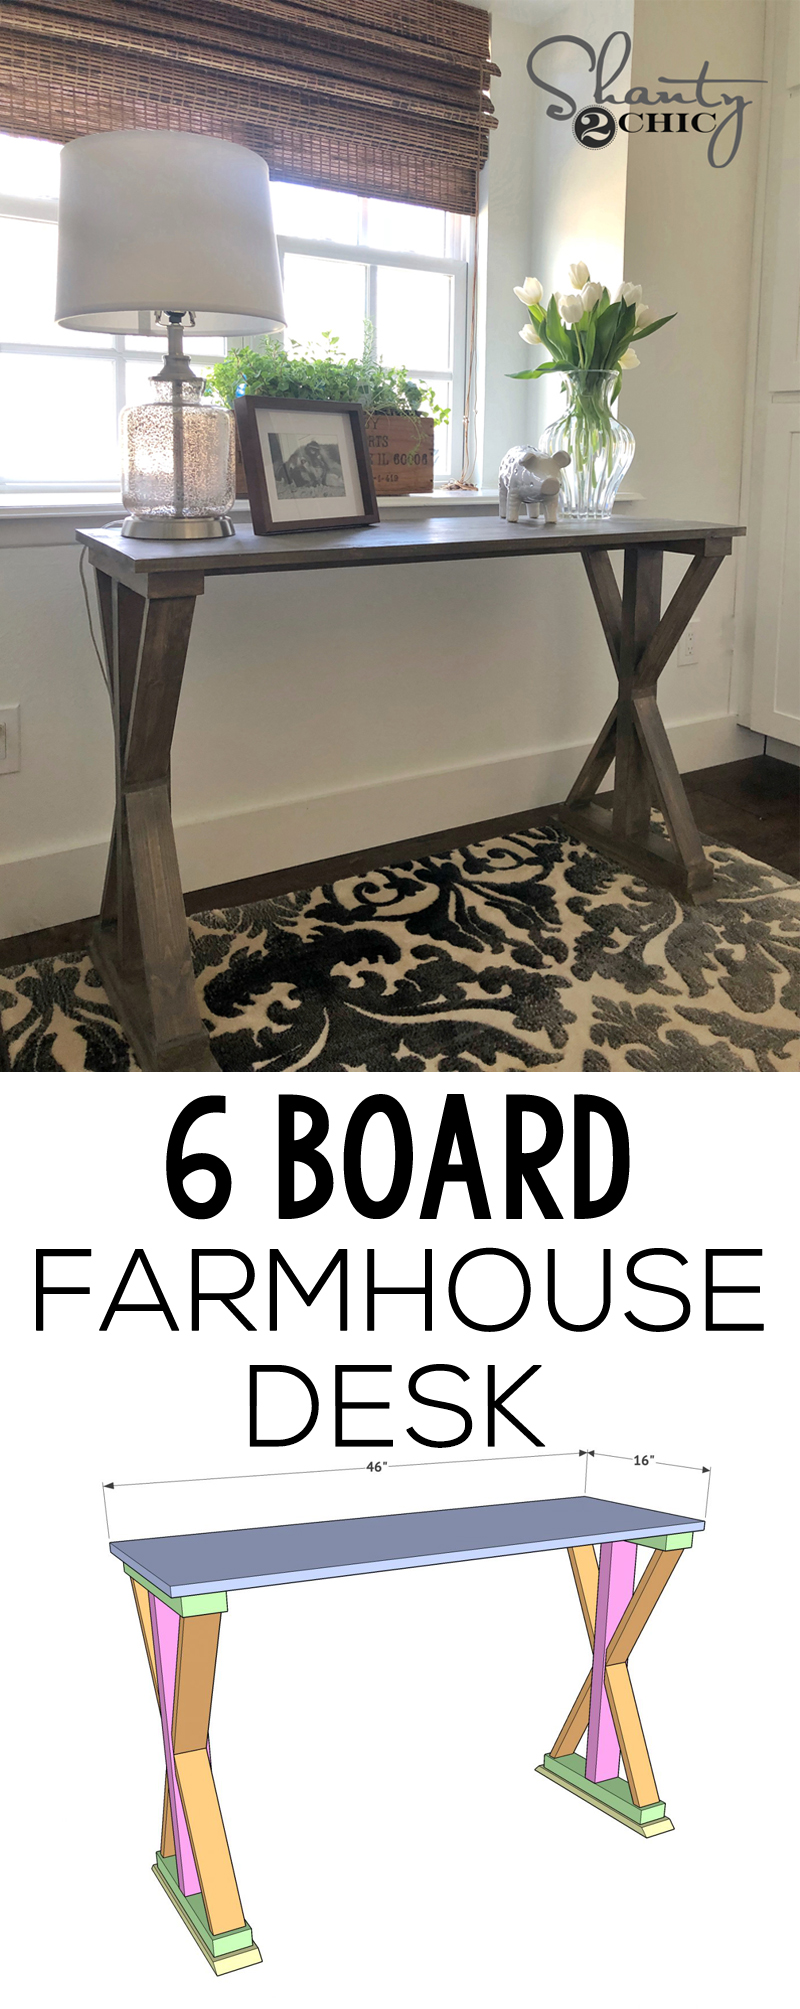 Diy 6 Board Farmhouse Desk Only 30 For This Diy Desk